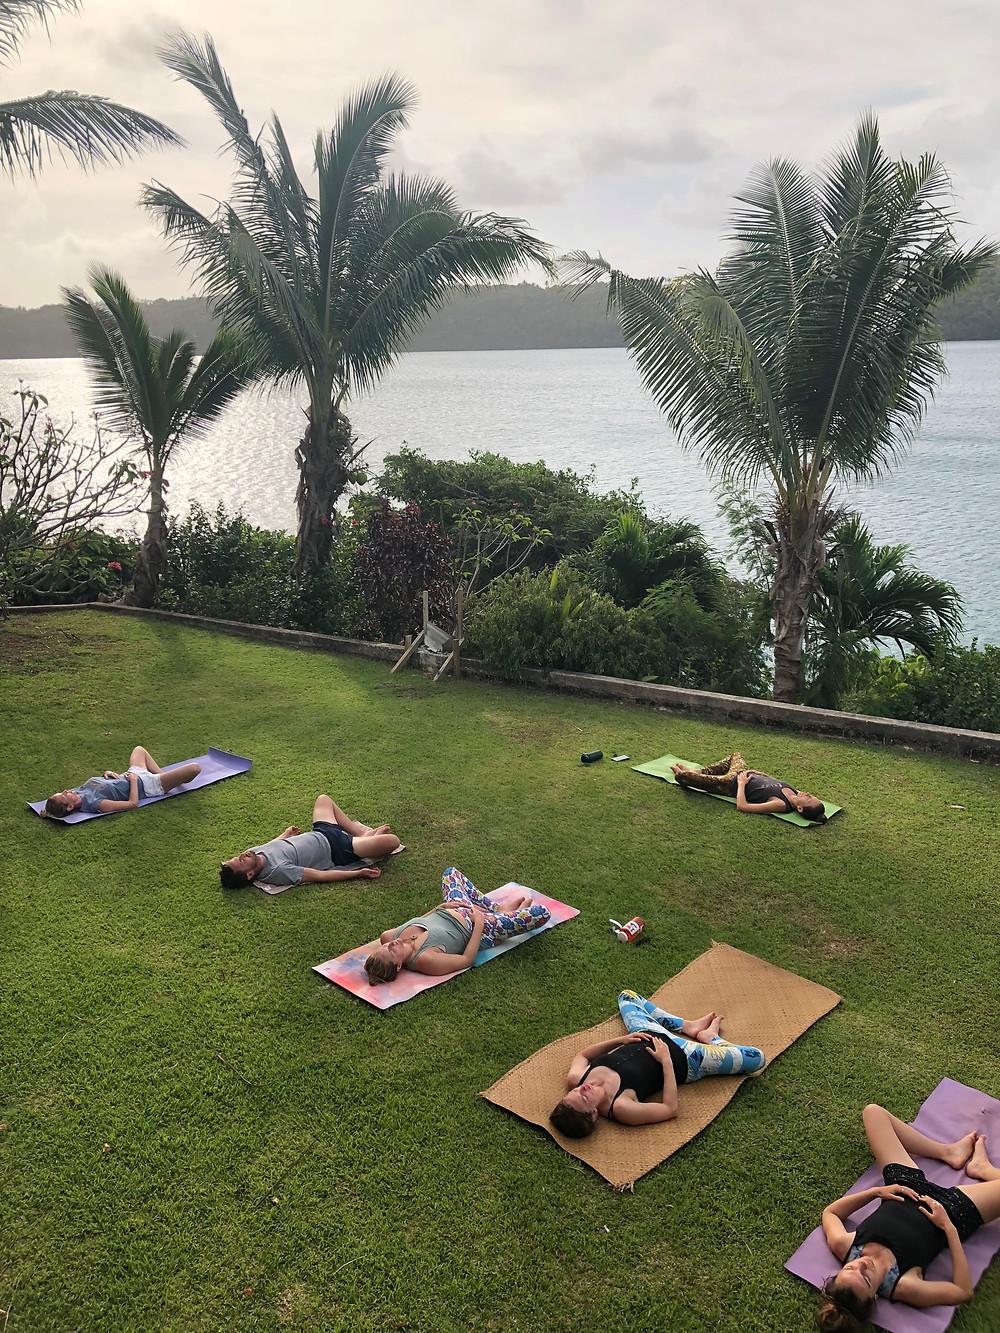 Outdoor Yoga with ocean views.